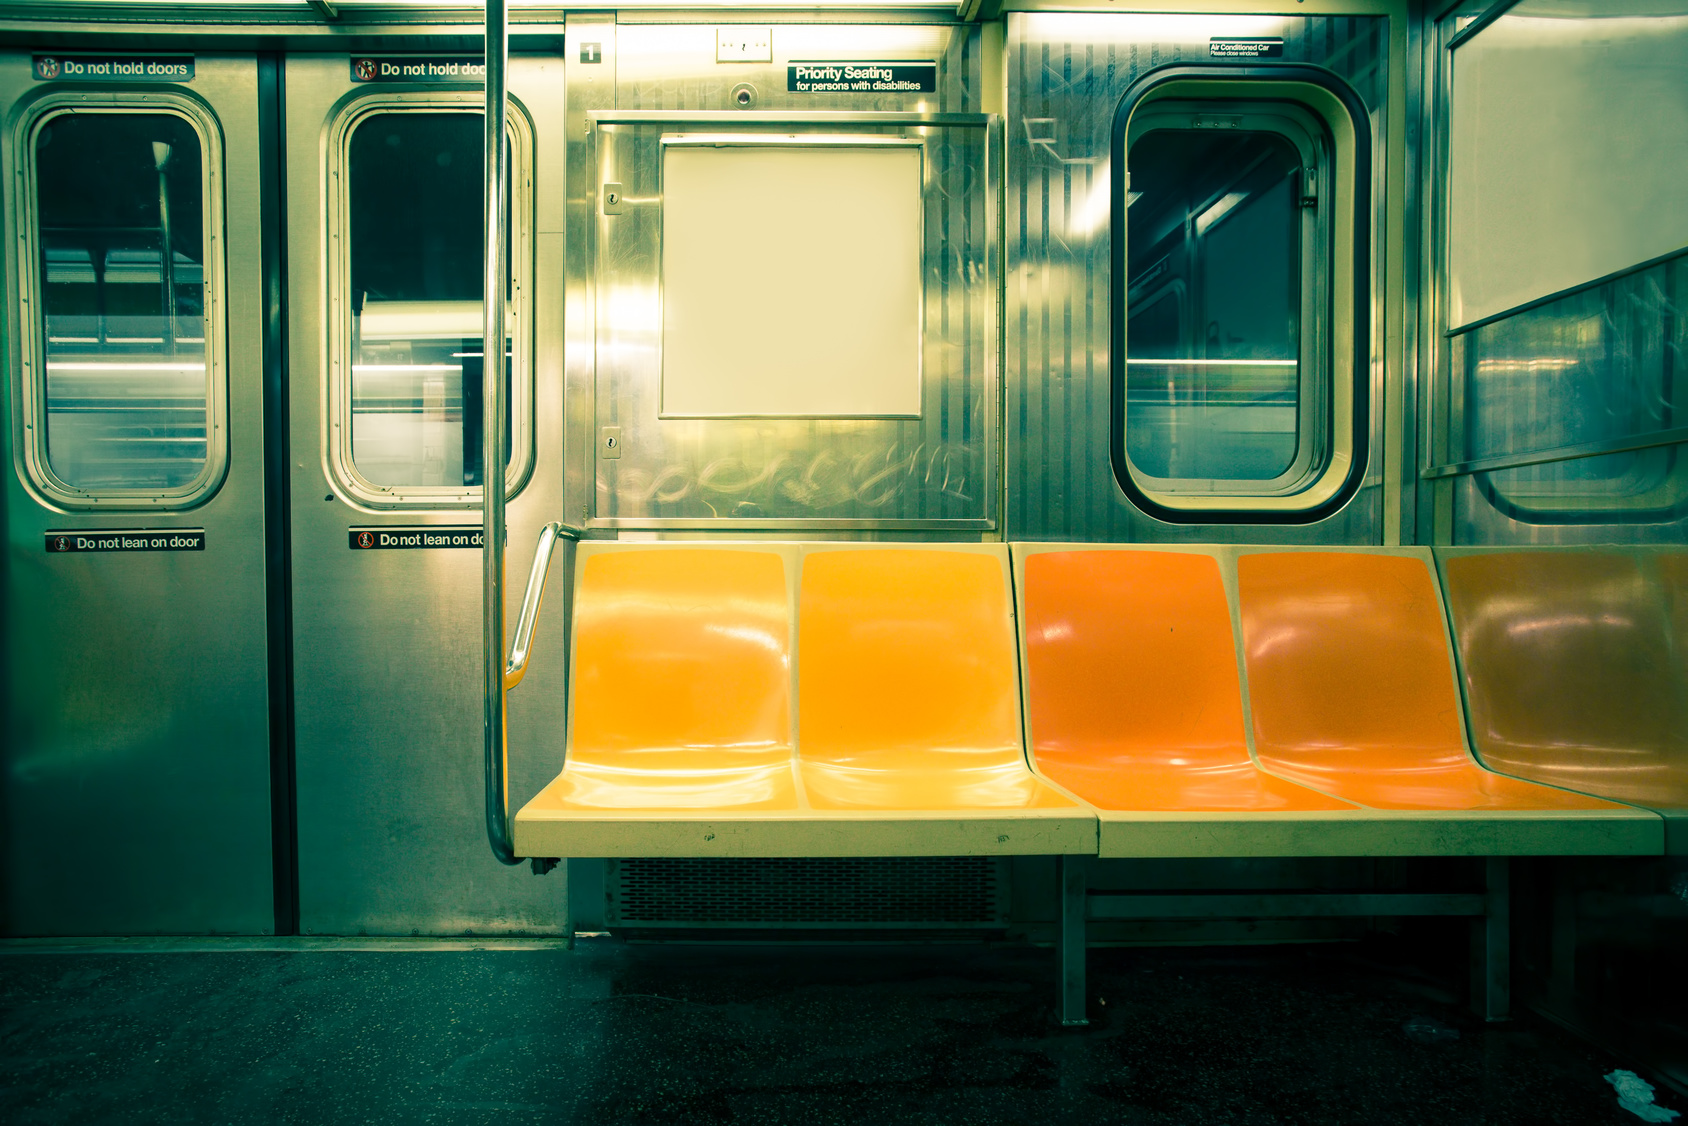 Vintage toned image of New York City subway car